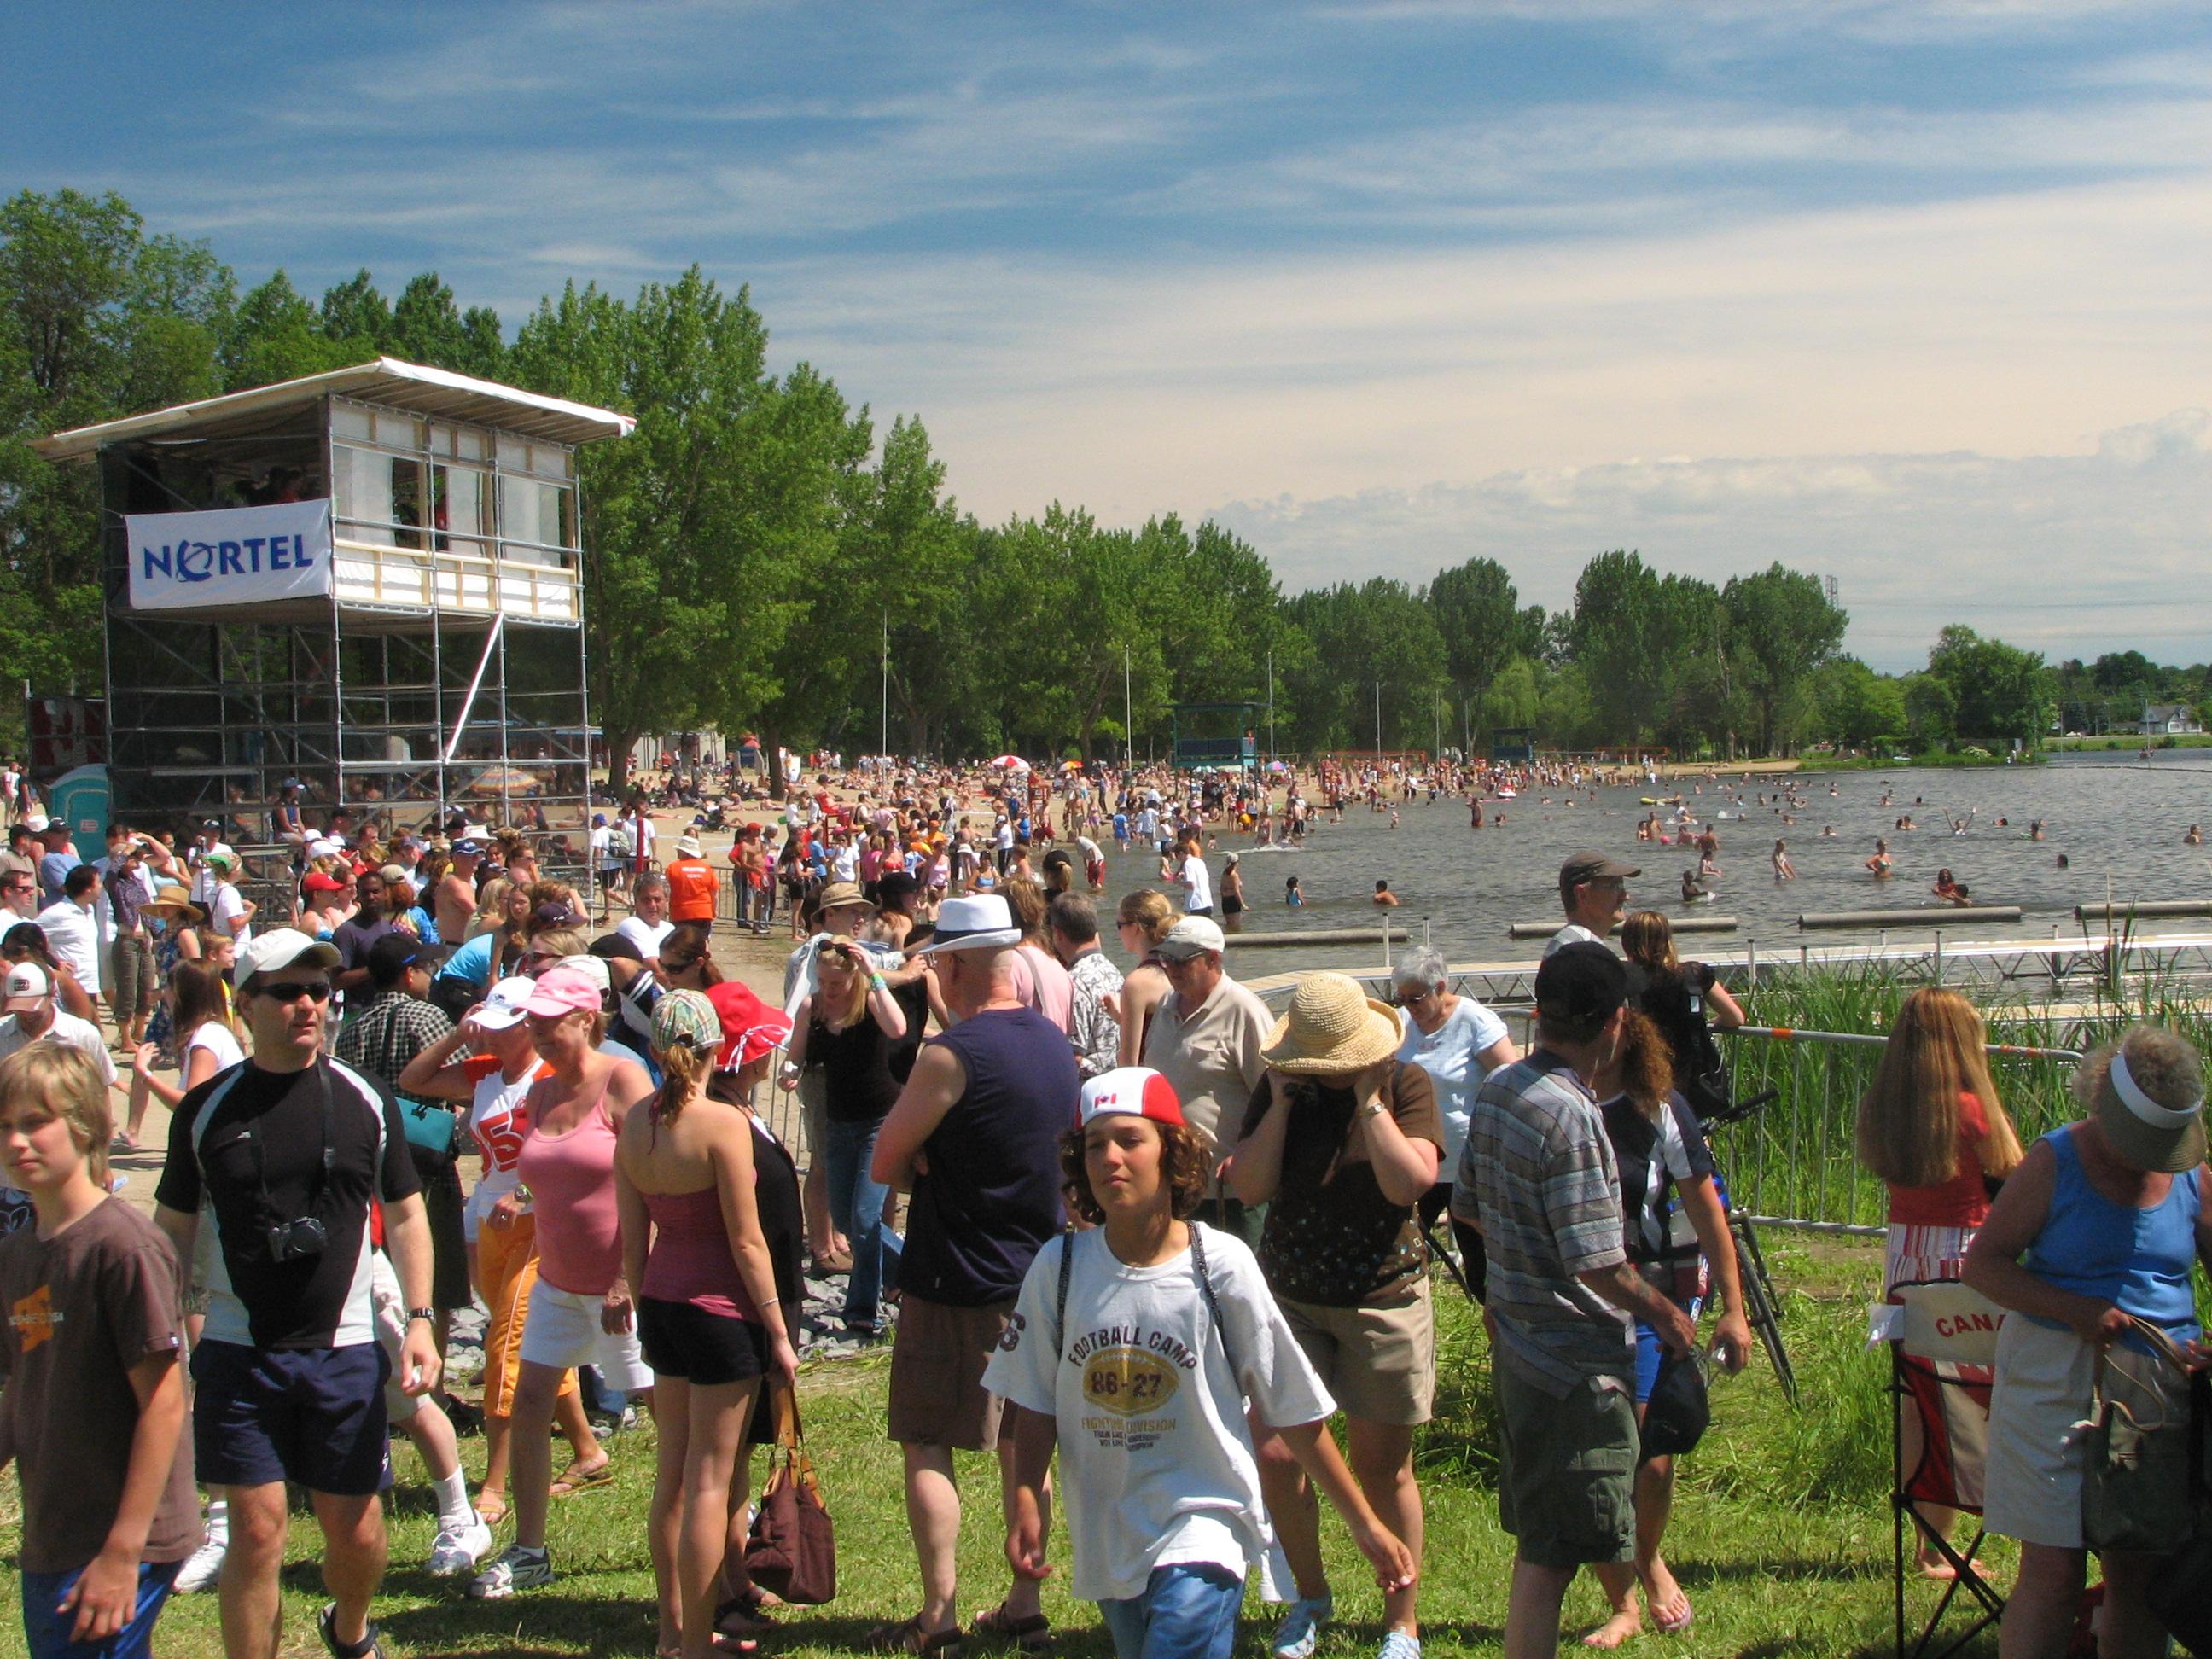 List of festivals in Ottawa - Wikipedia